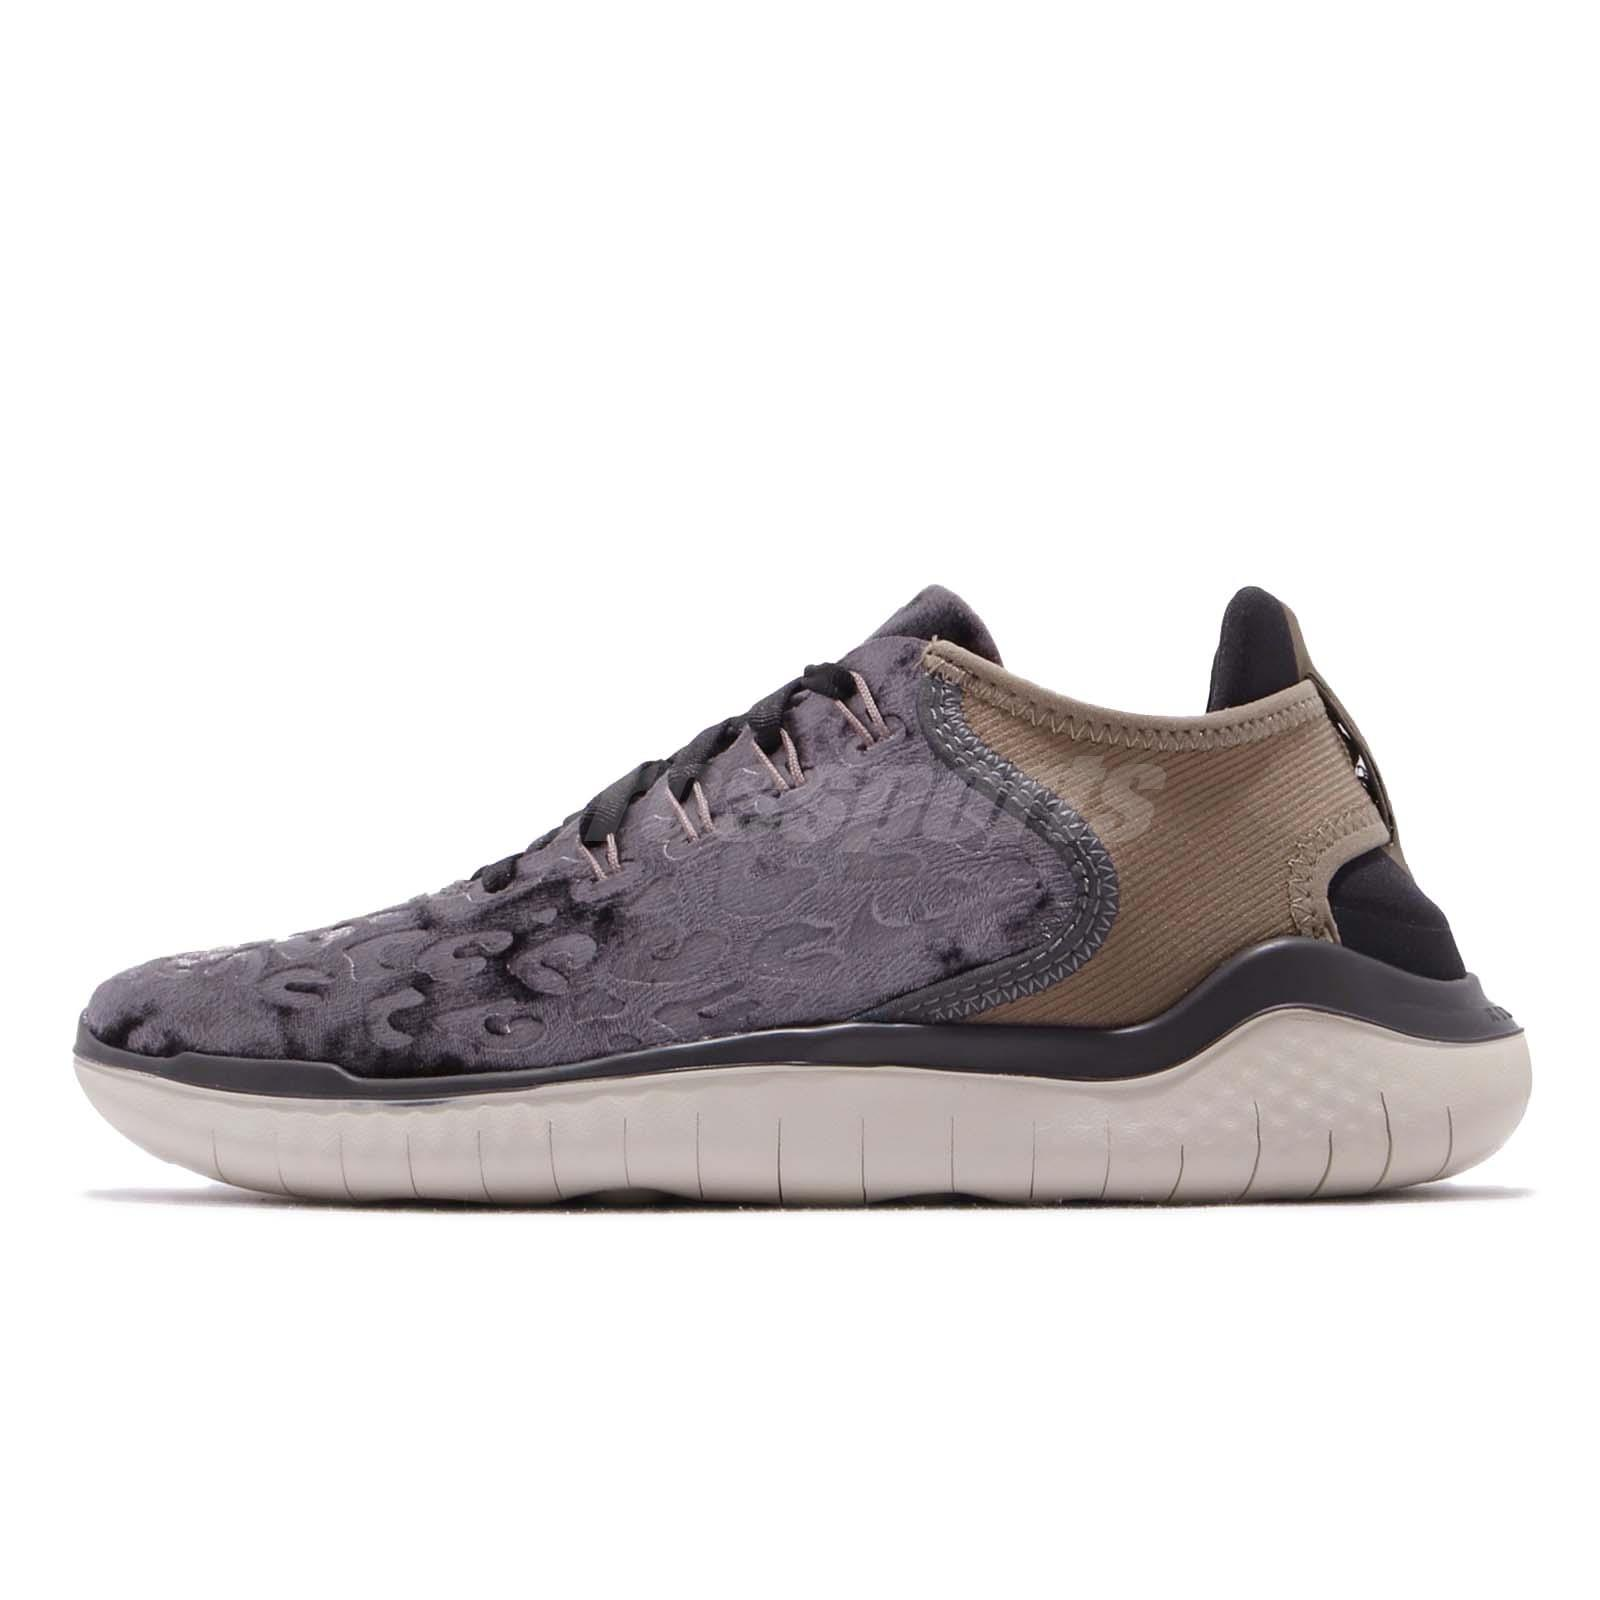 c80300a5b65 Nike Wmns Free RN 18 Wild Velvet Oil Grey Brown Women Running Shoes AQ0563- 020